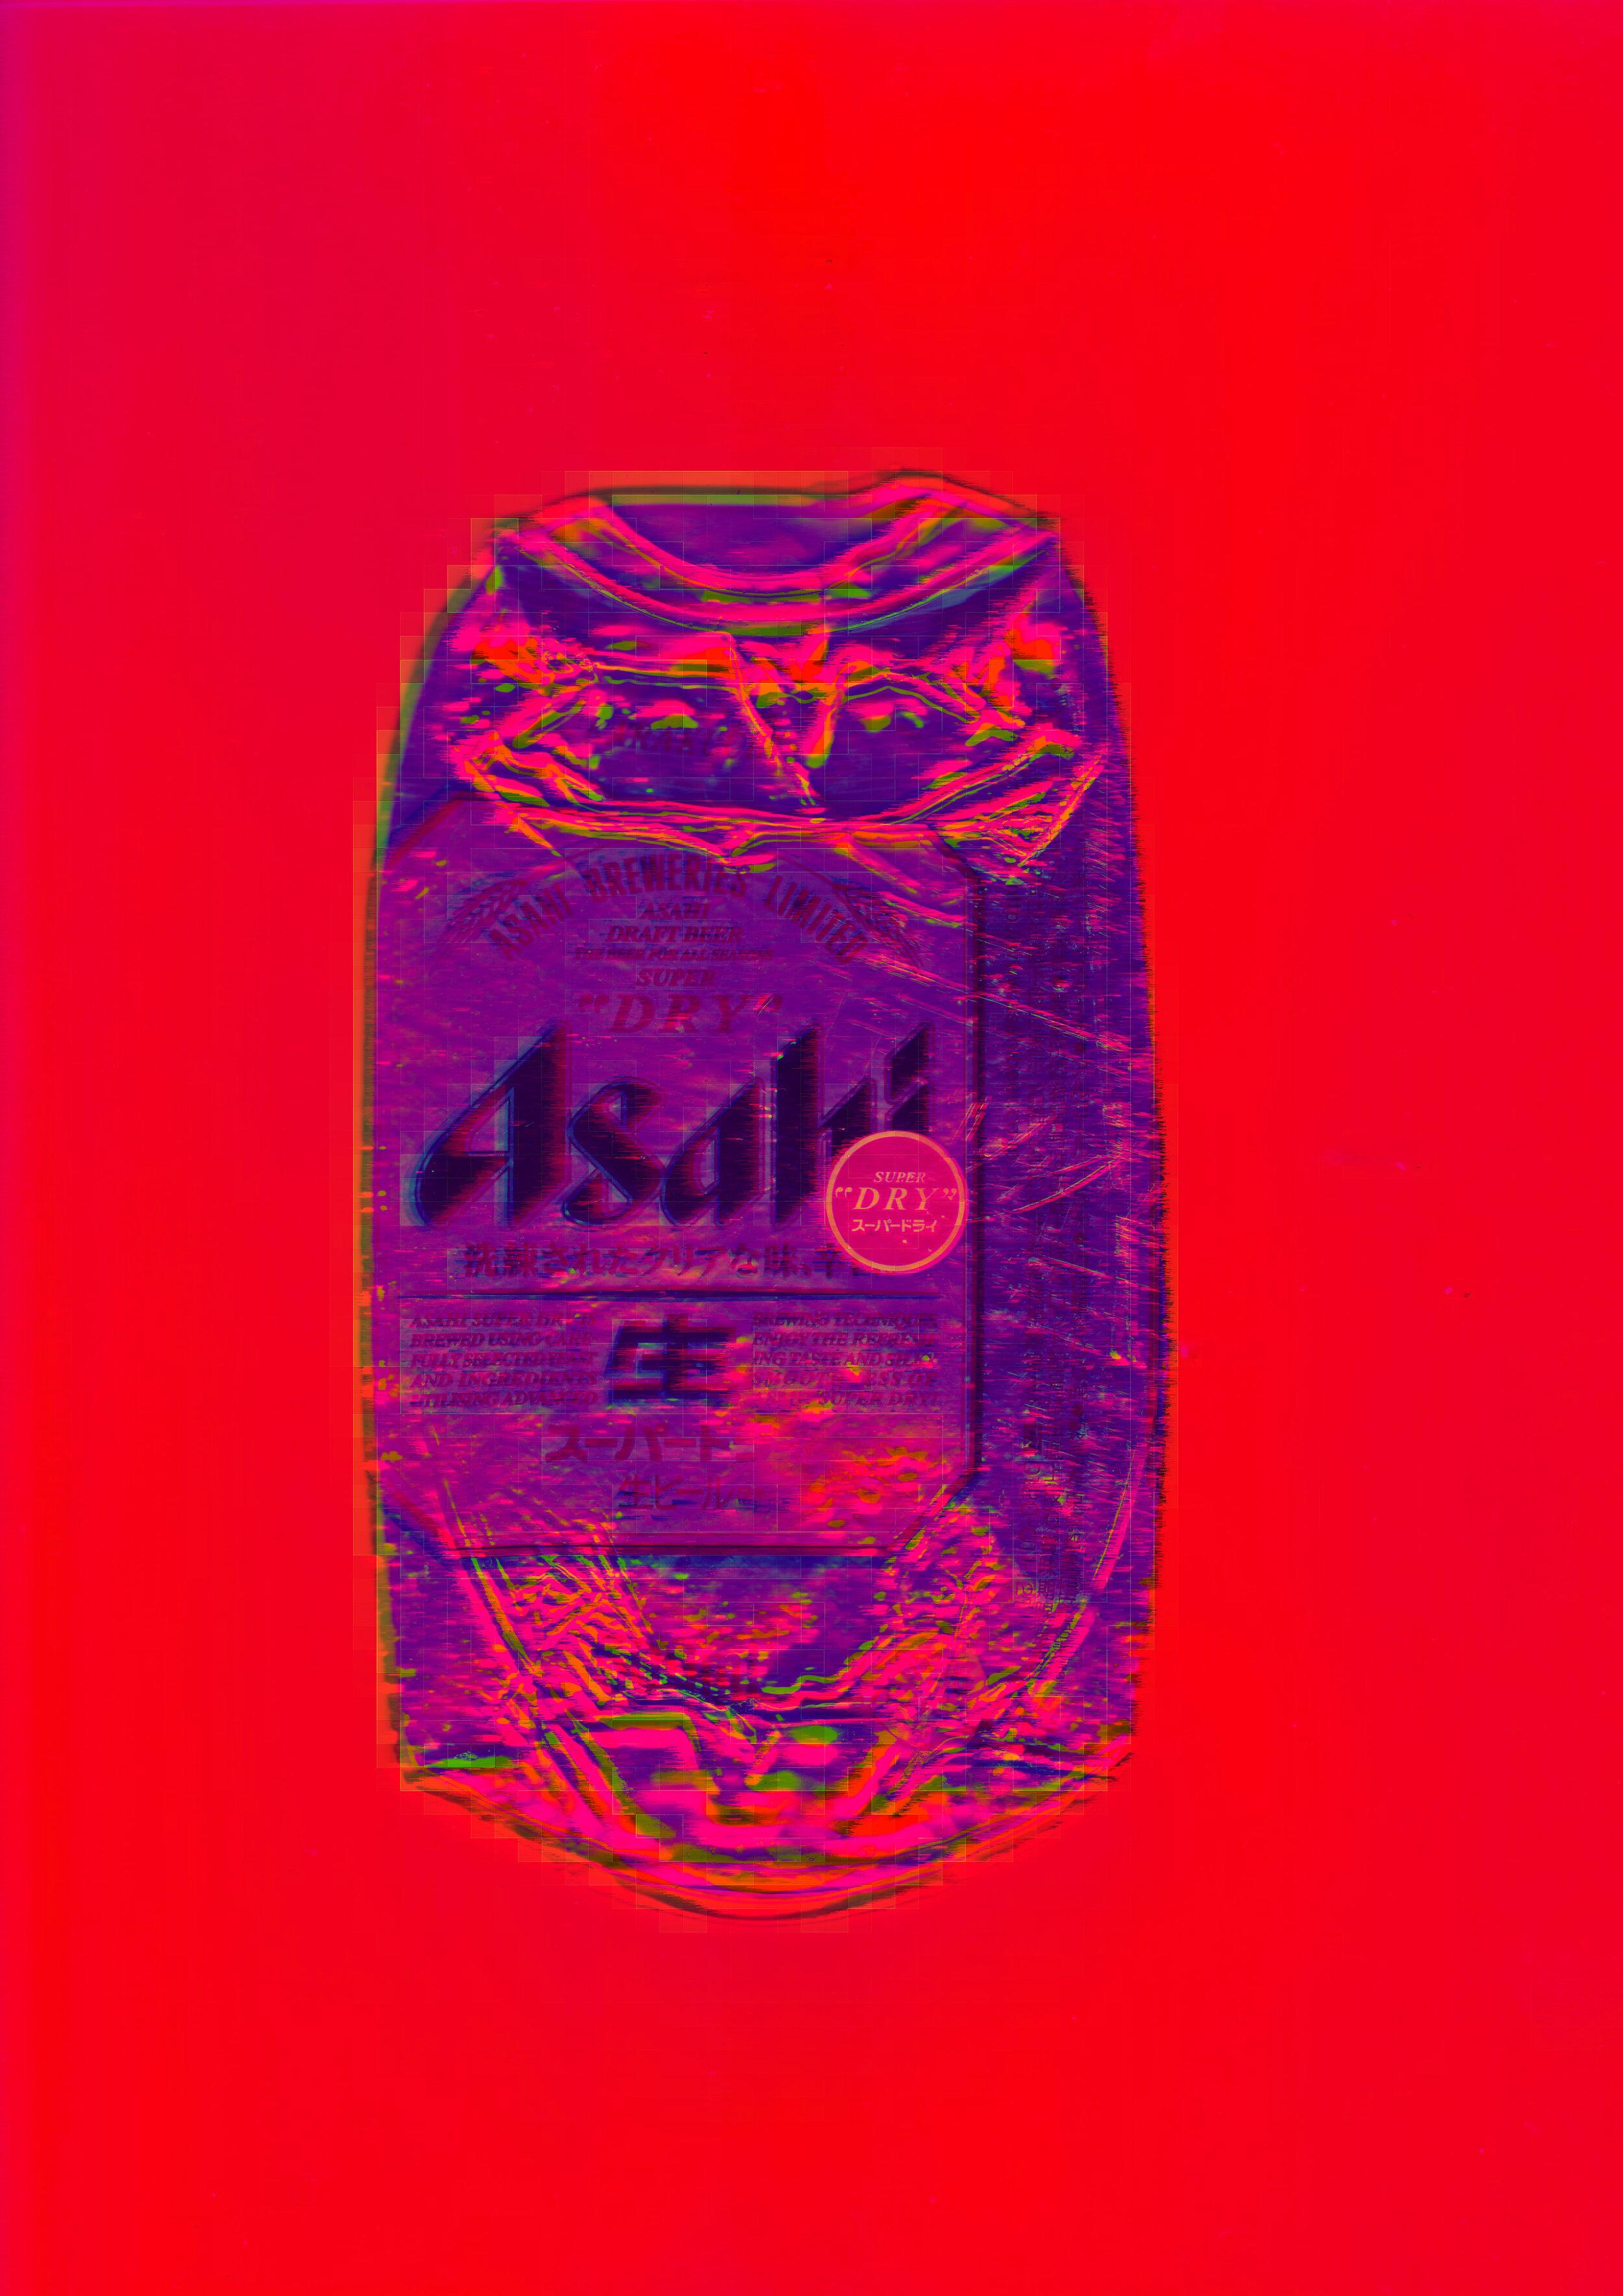 File0011c.jpg